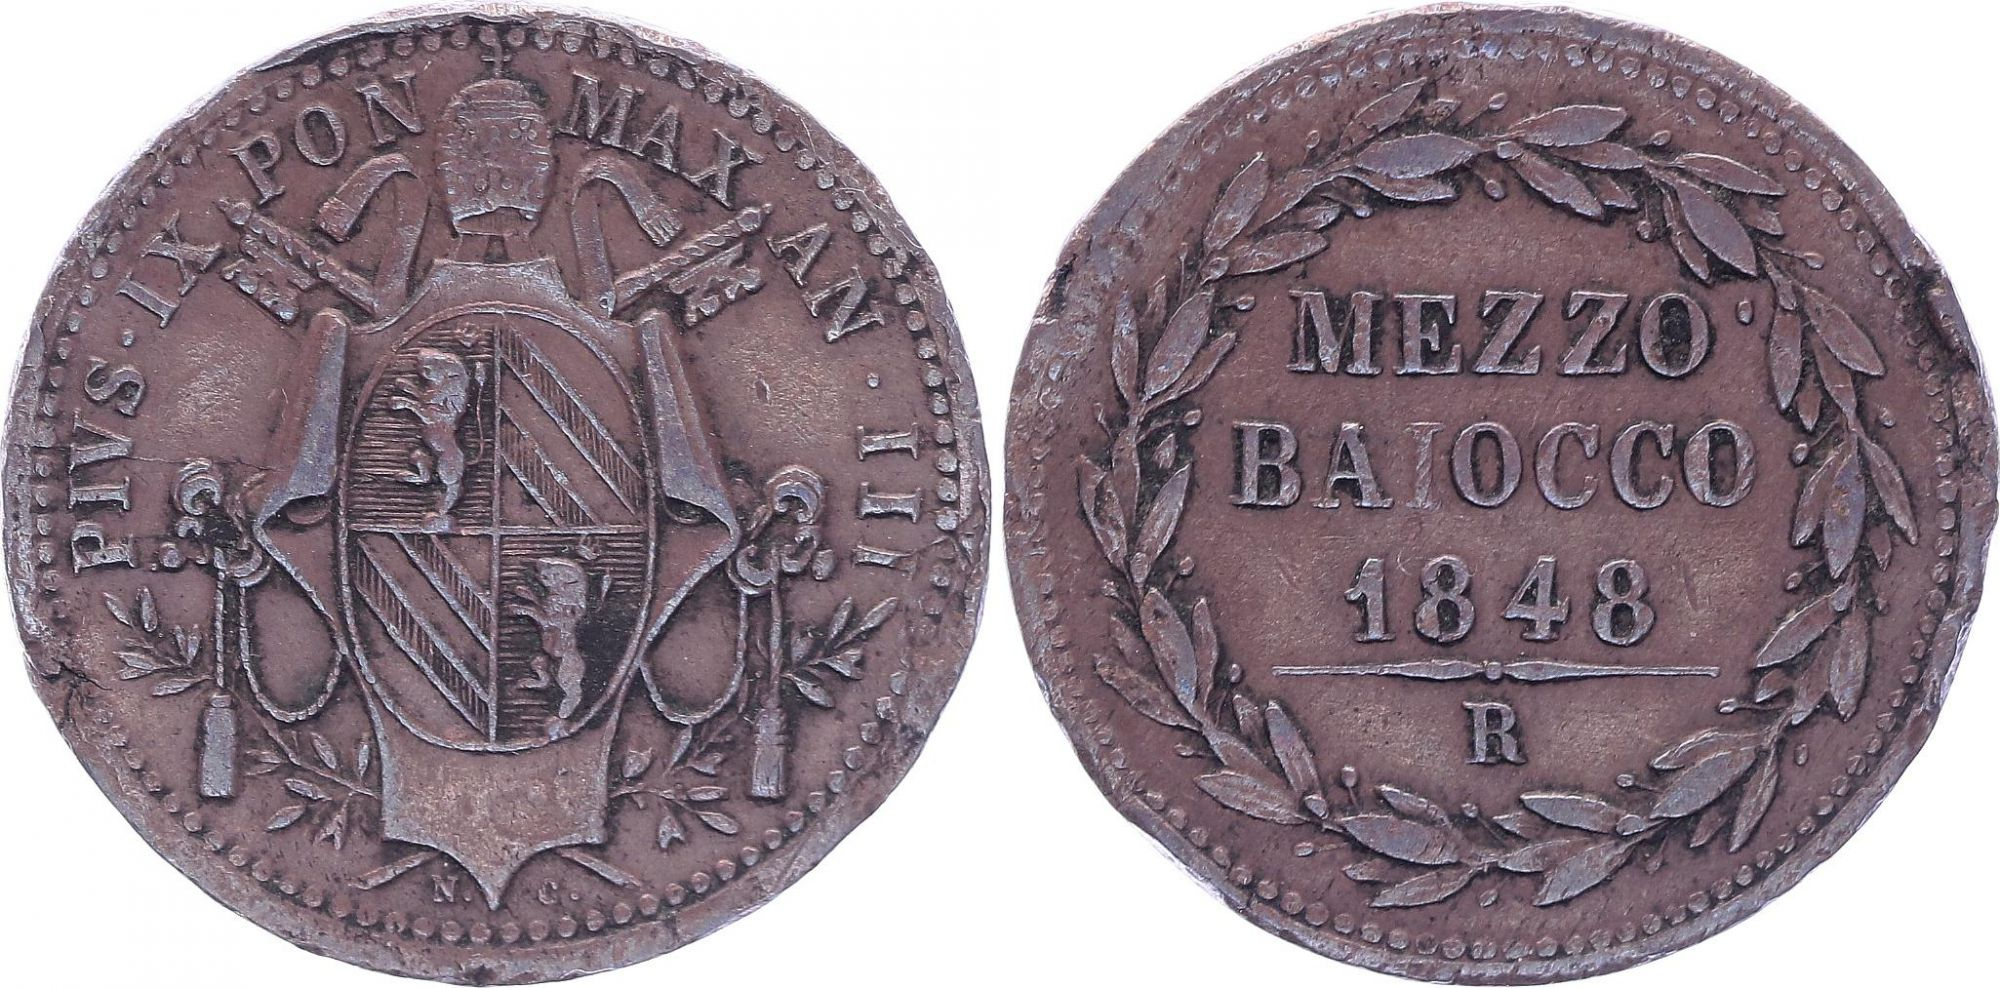 Etat Pontifical Mezzo Baiocco - Pivs IX - 1848 R IIII